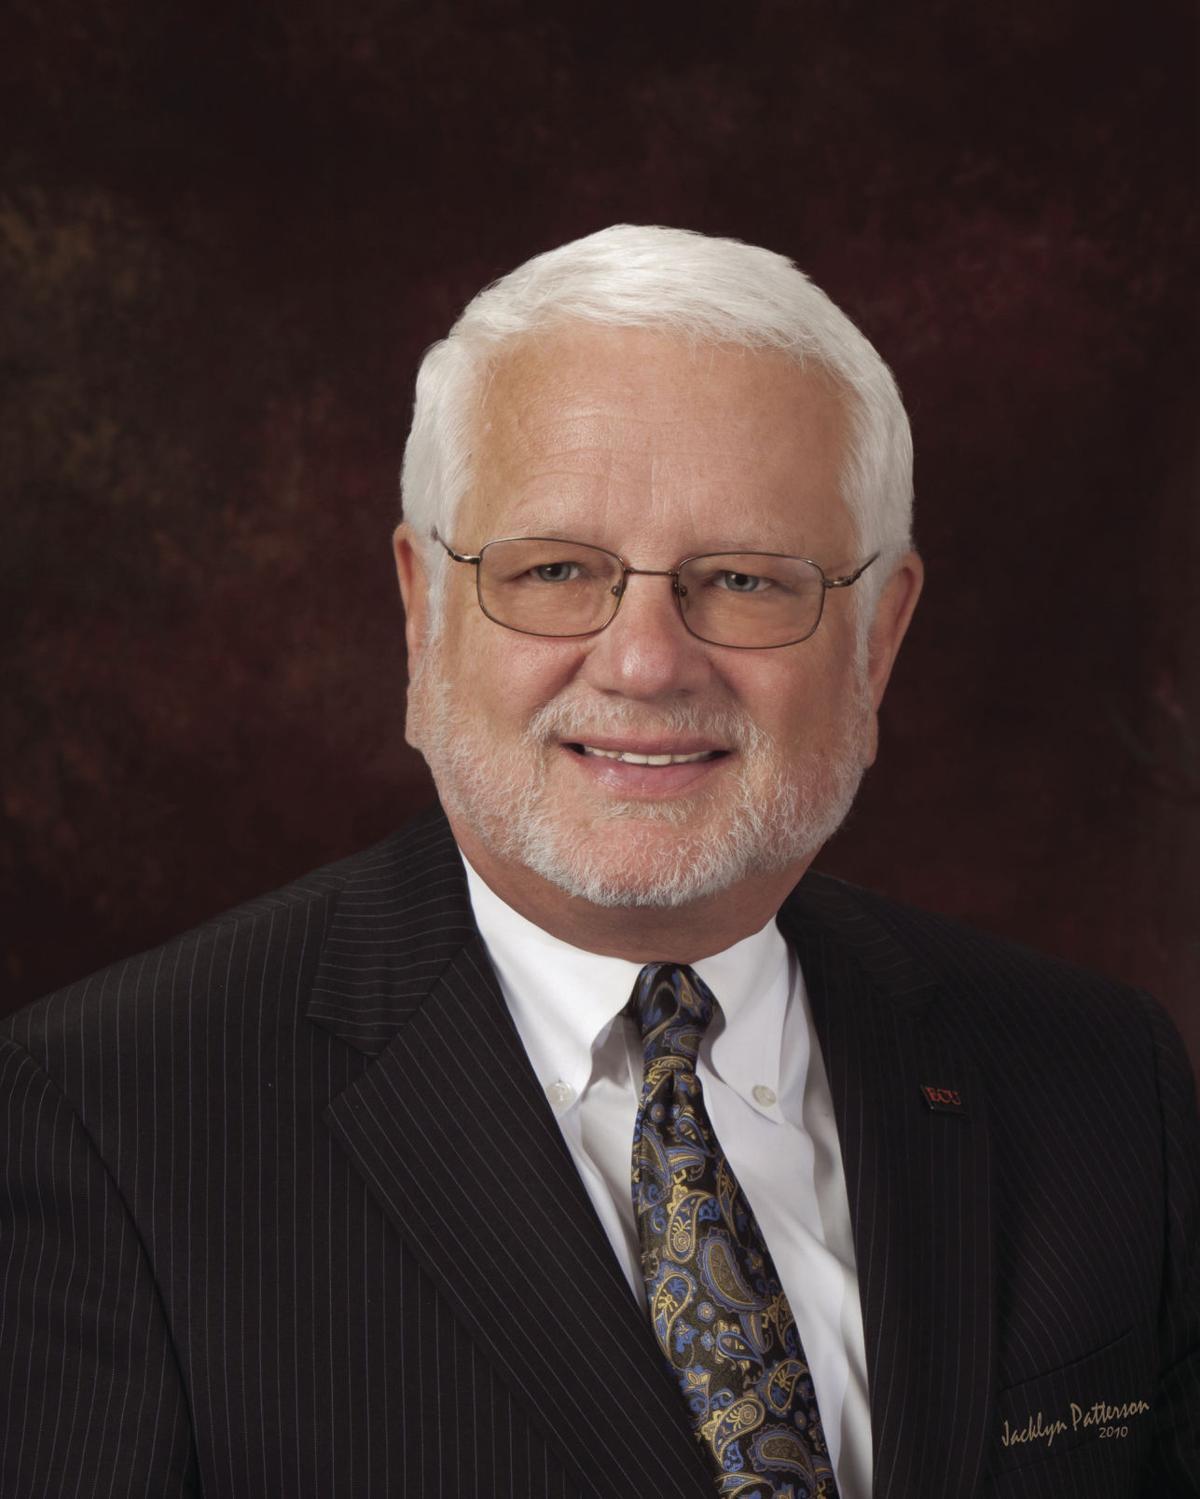 John R. Hargrave